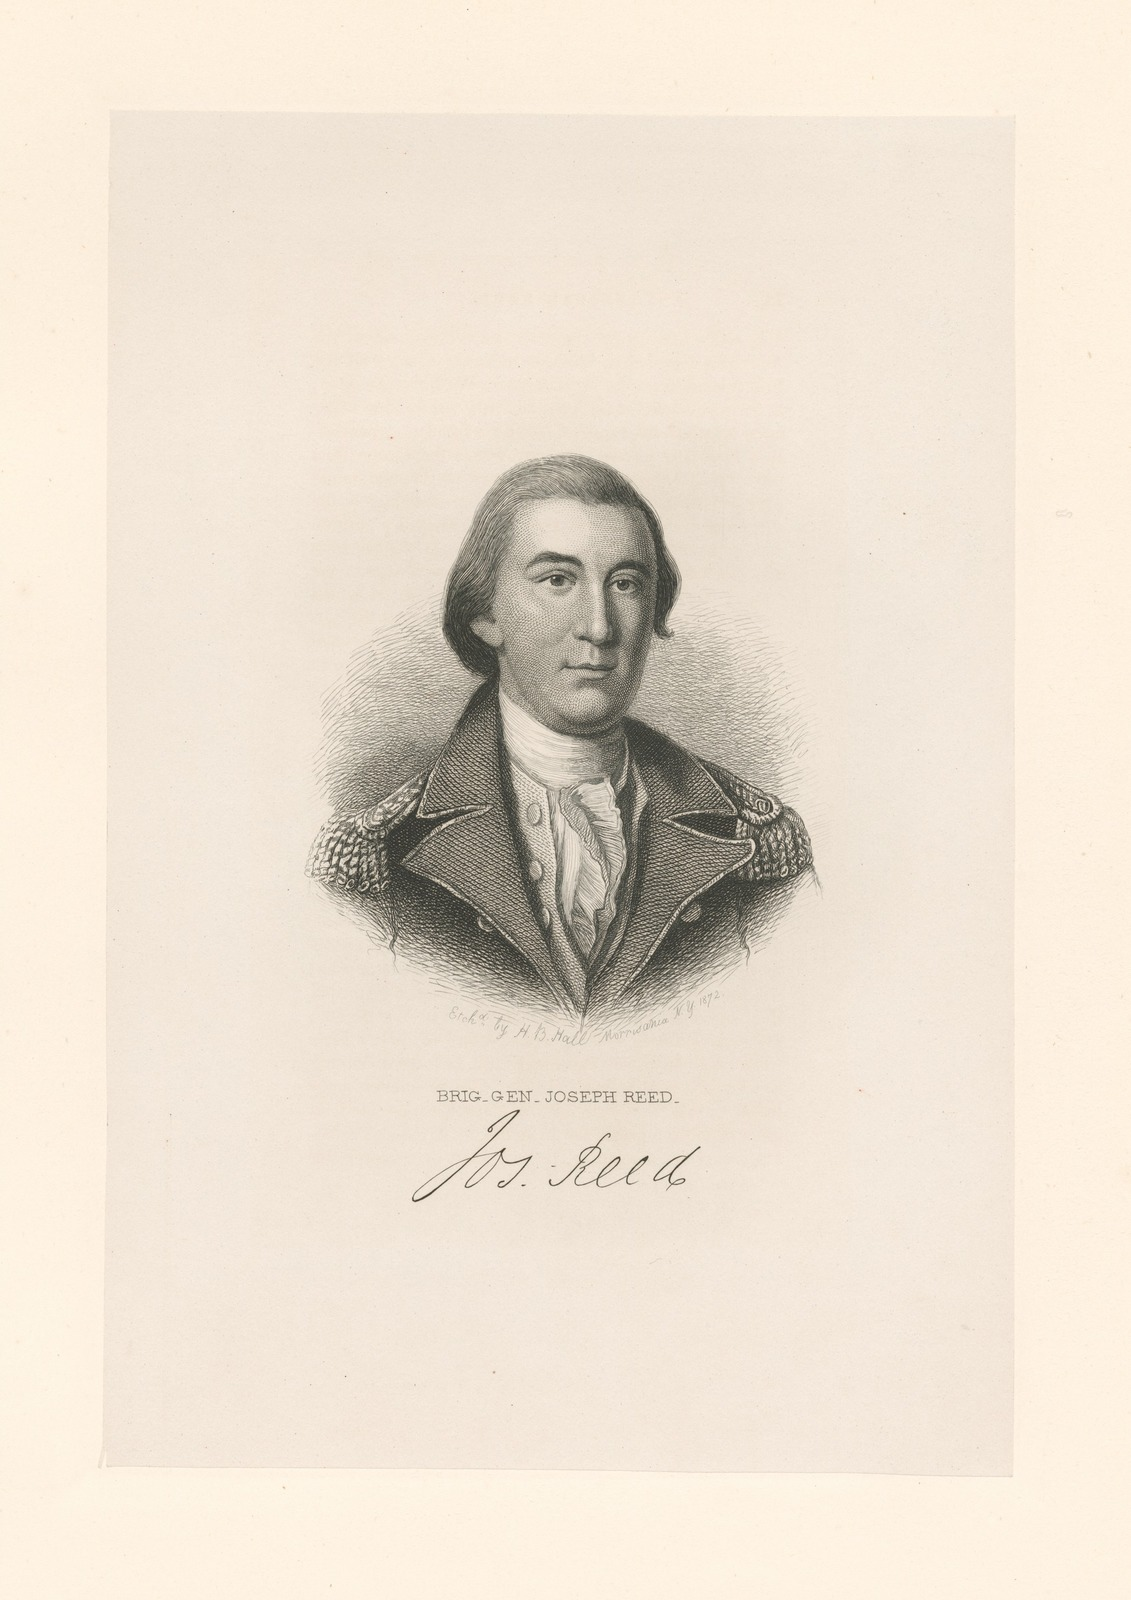 Brig. Gen. Joseph Reed